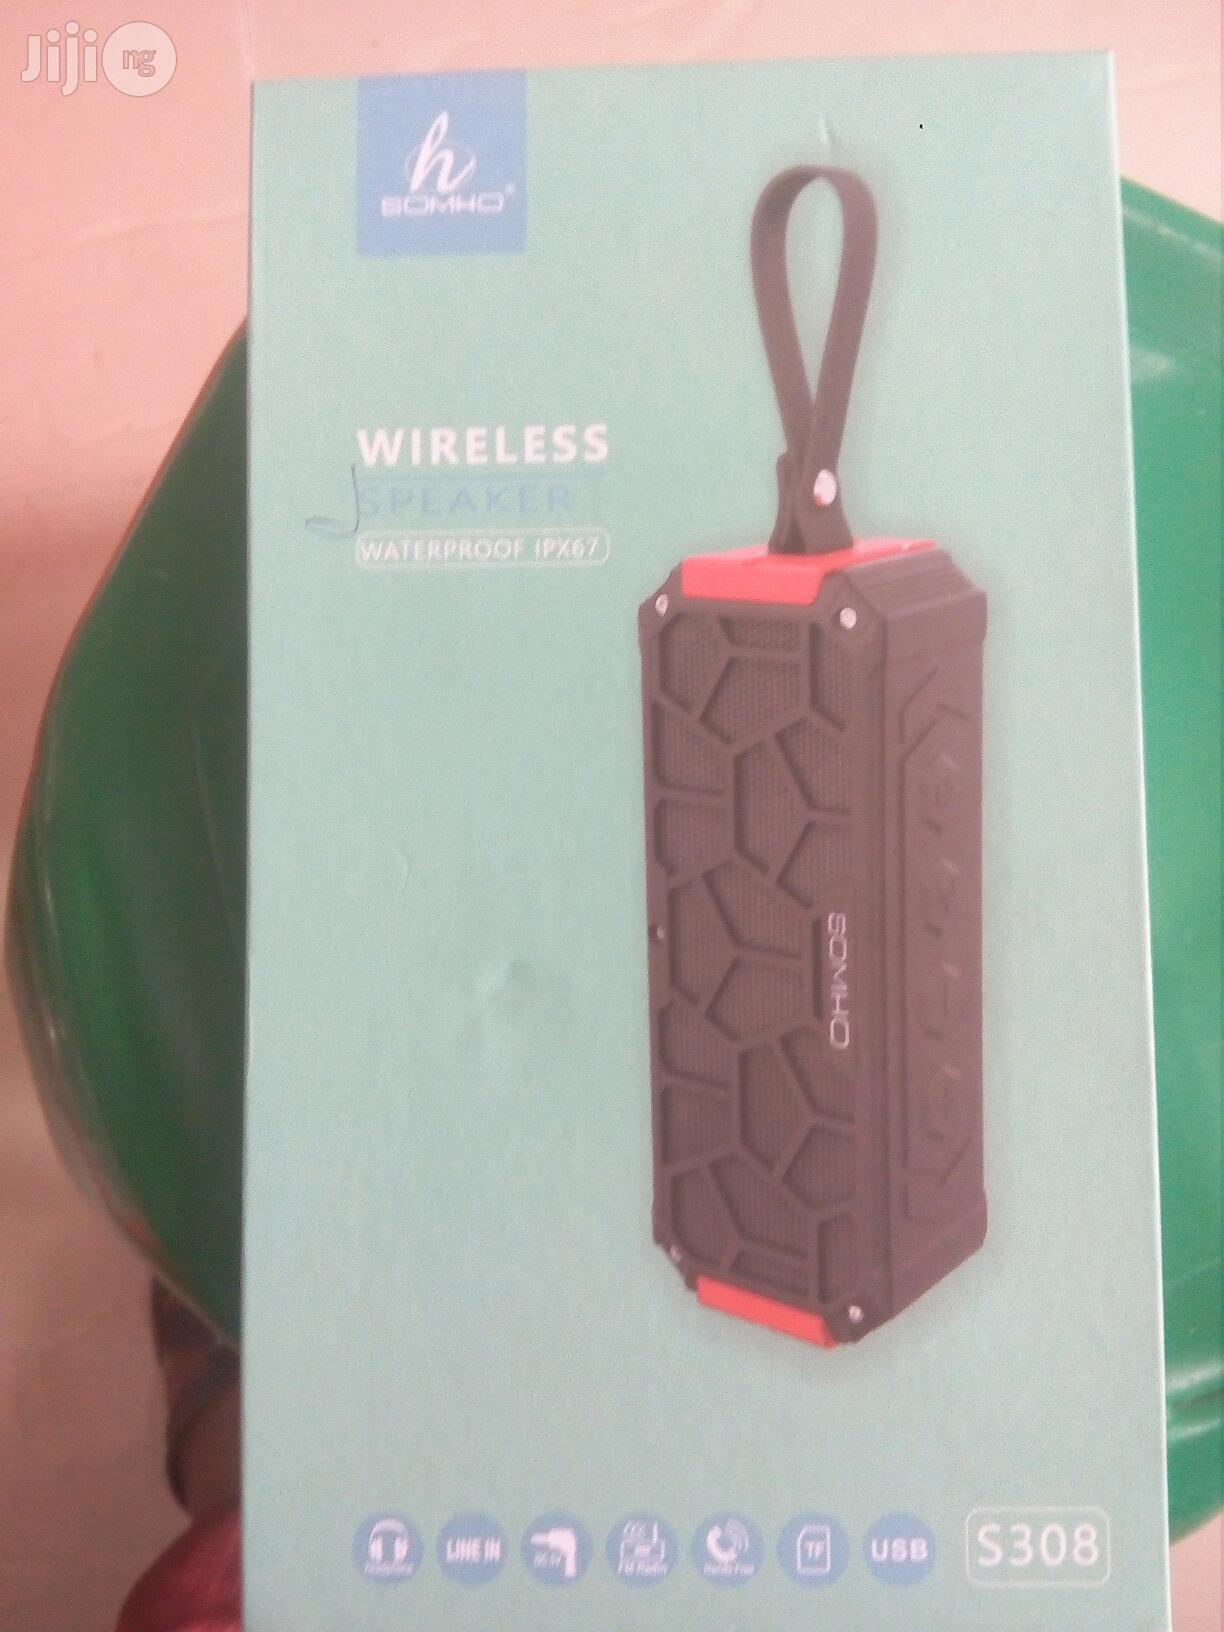 Somho S308 Ipx7 Waterproof Mini Bluetooth Speaker